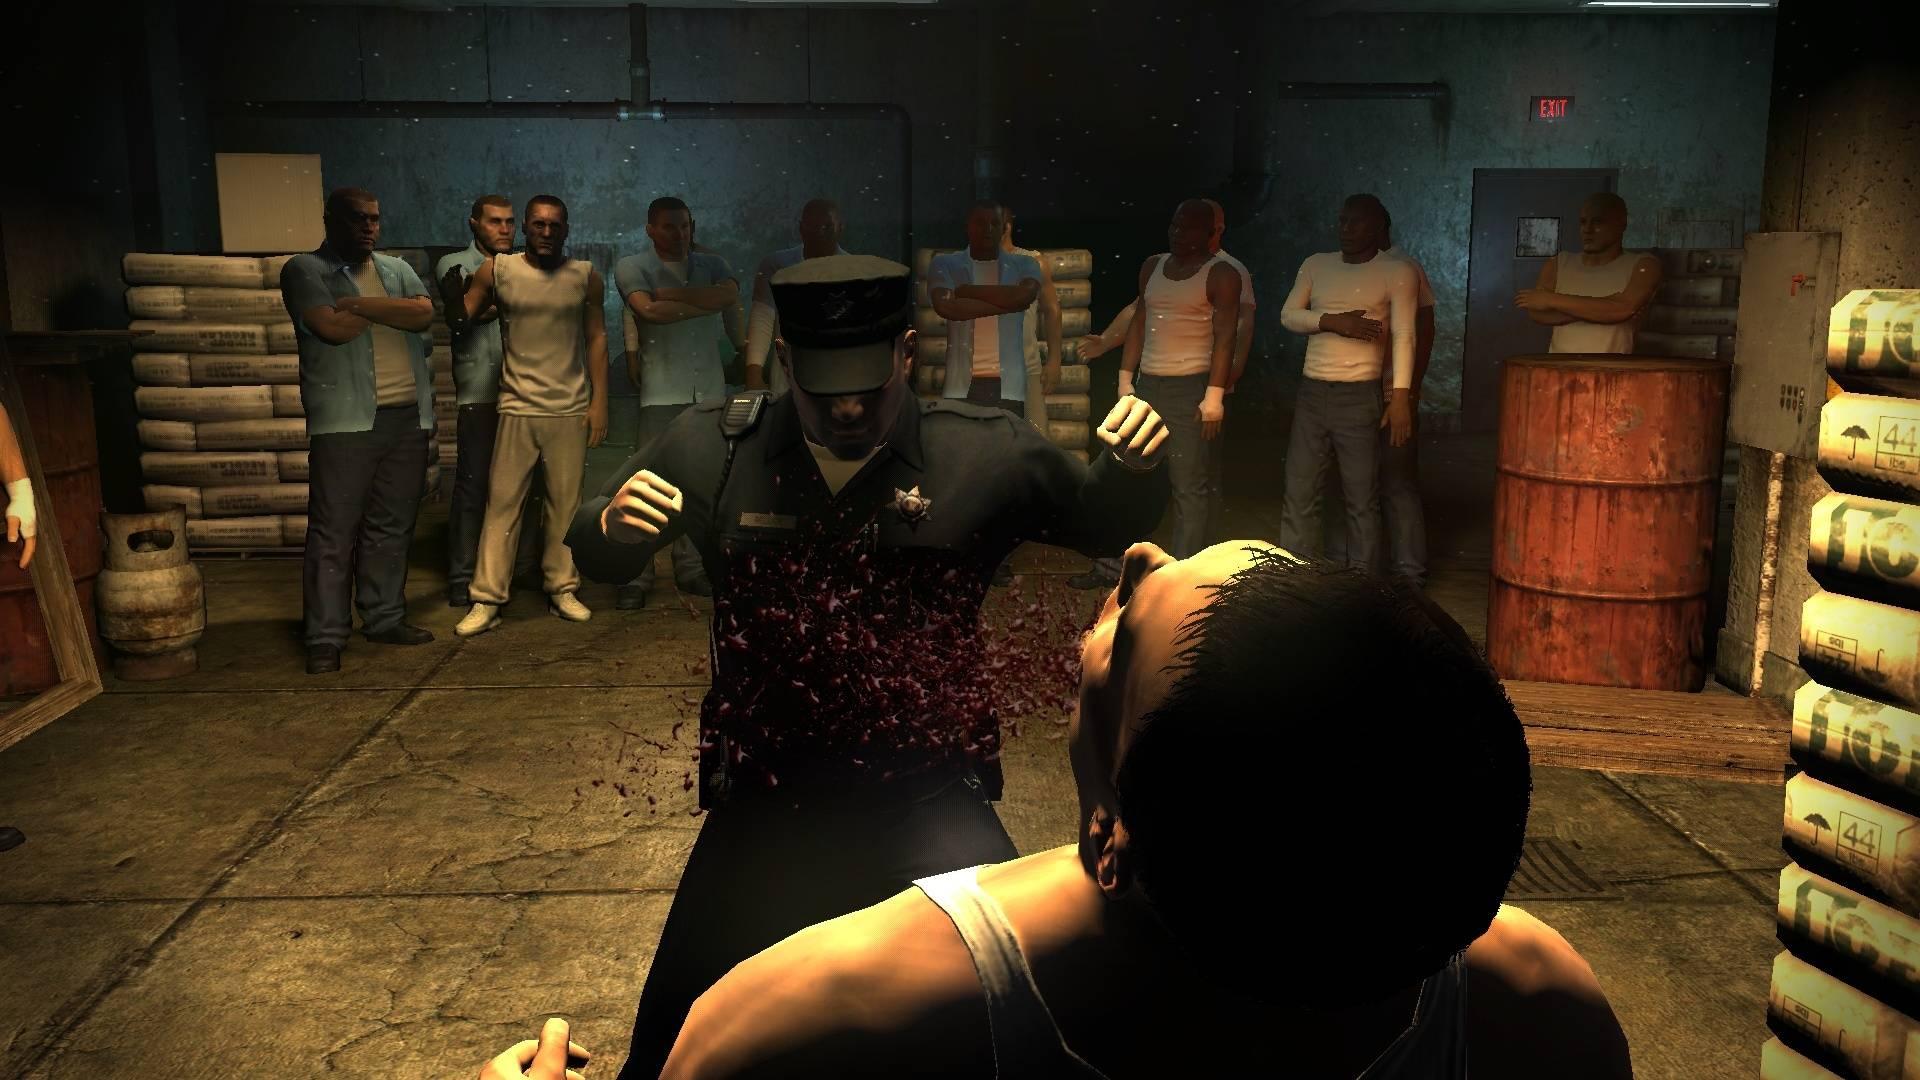 prisonbreak-all-all-screenshot-screenshot014